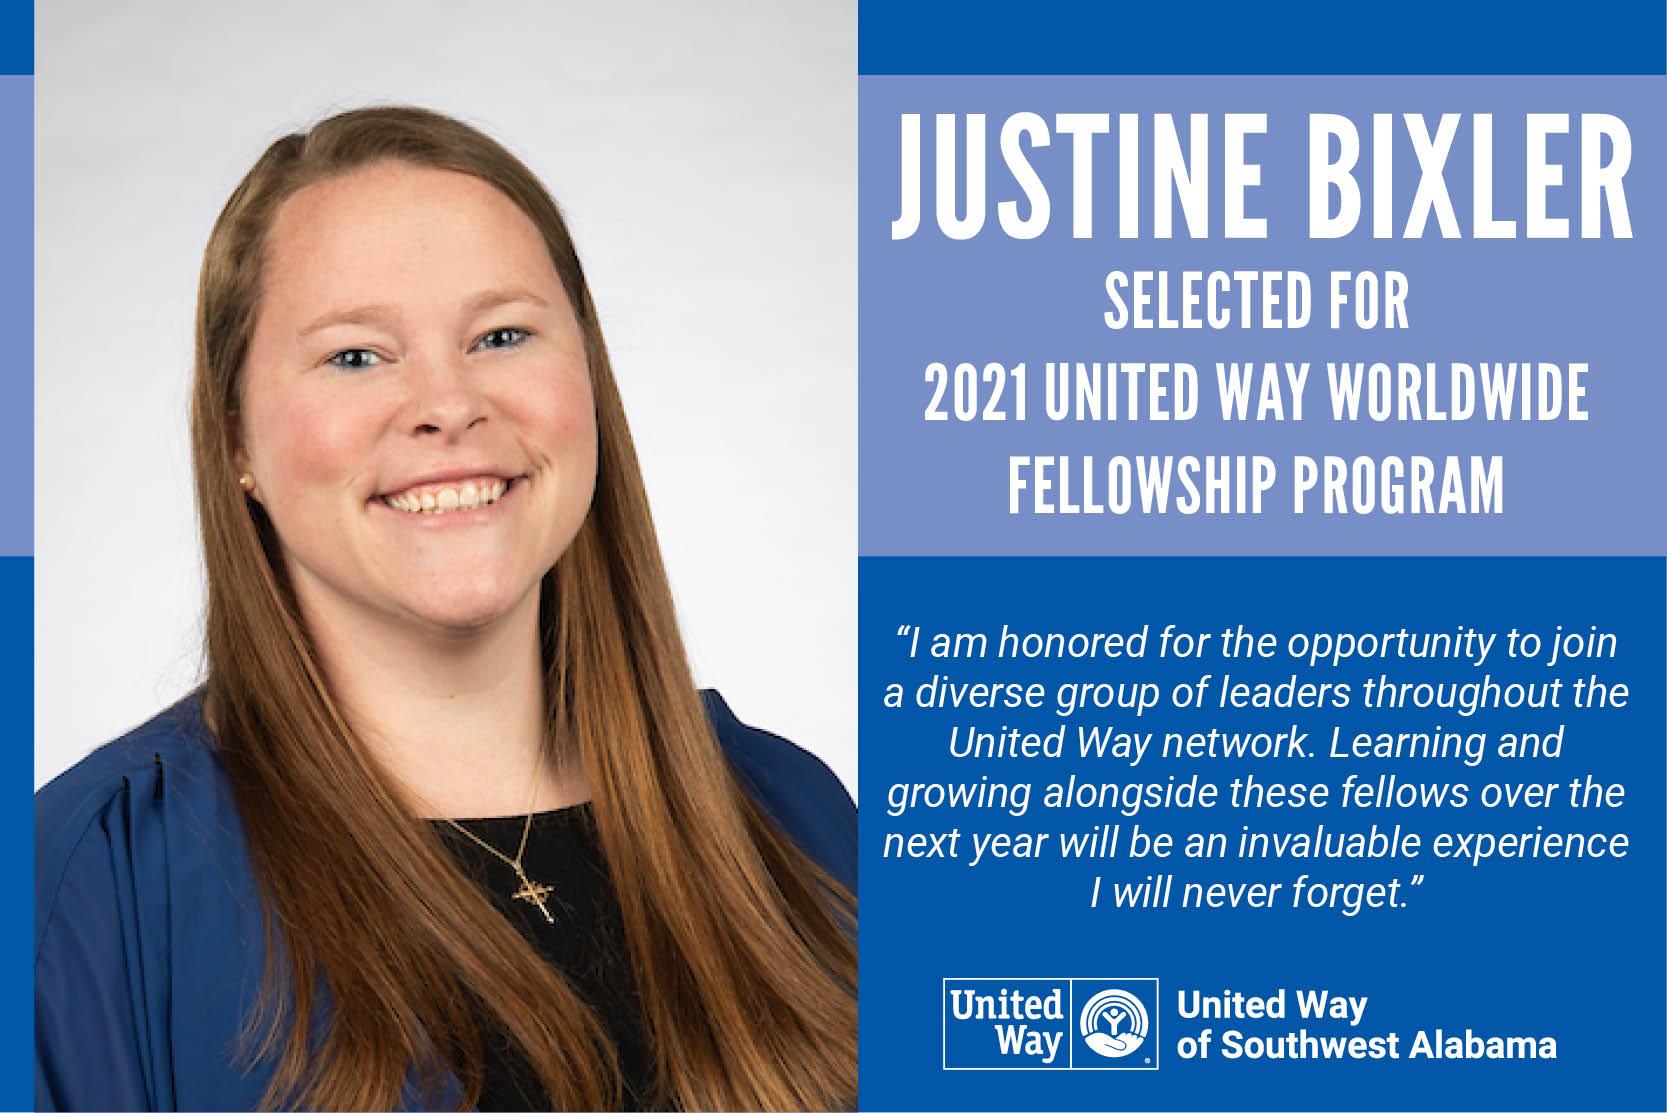 Bixler selected for United Way Worldwide Followship Program